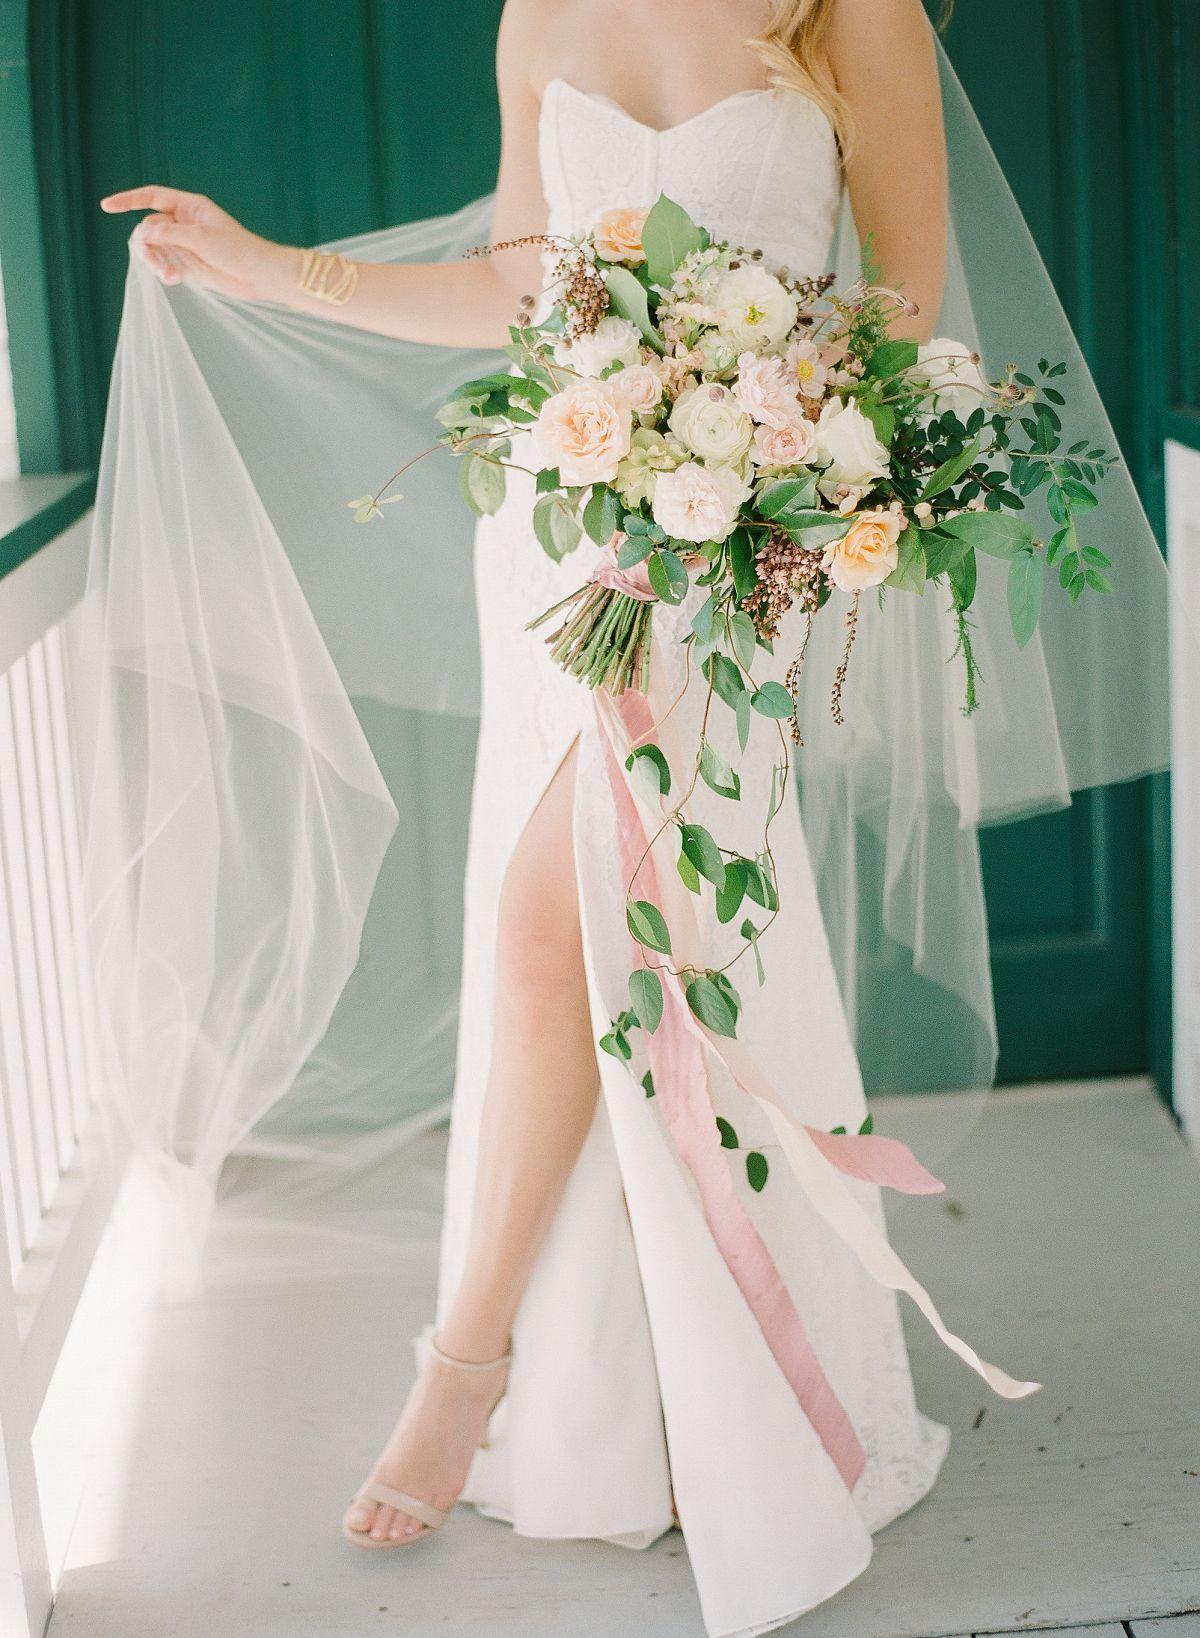 Heirloom Southern Belle Bridal Style in 2020 Belle